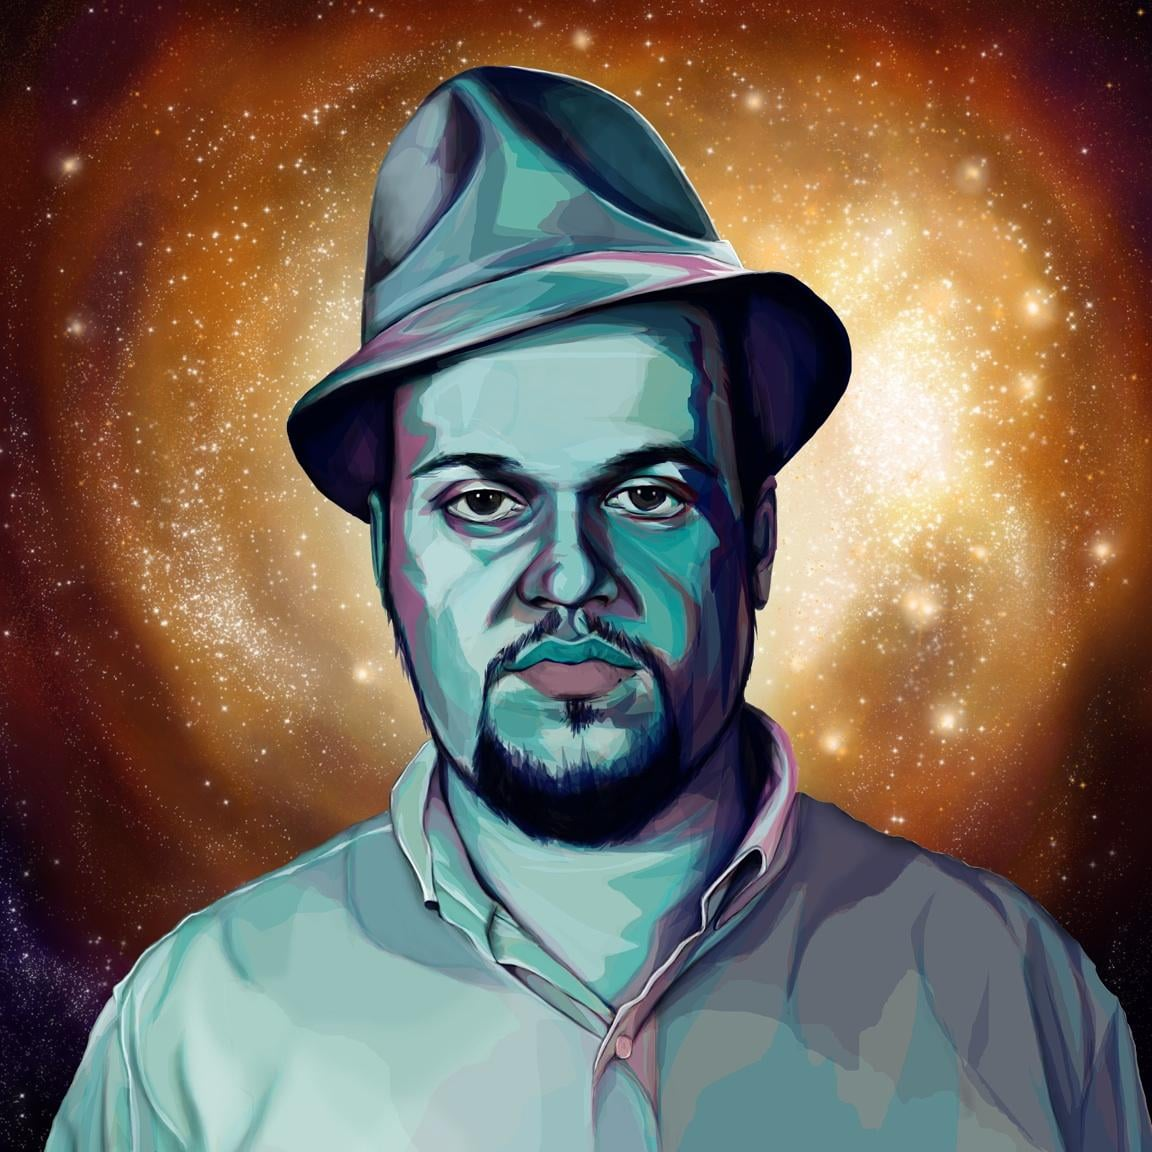 ALBUM COVER - MASTER OF THE UNIVERSE.JPG